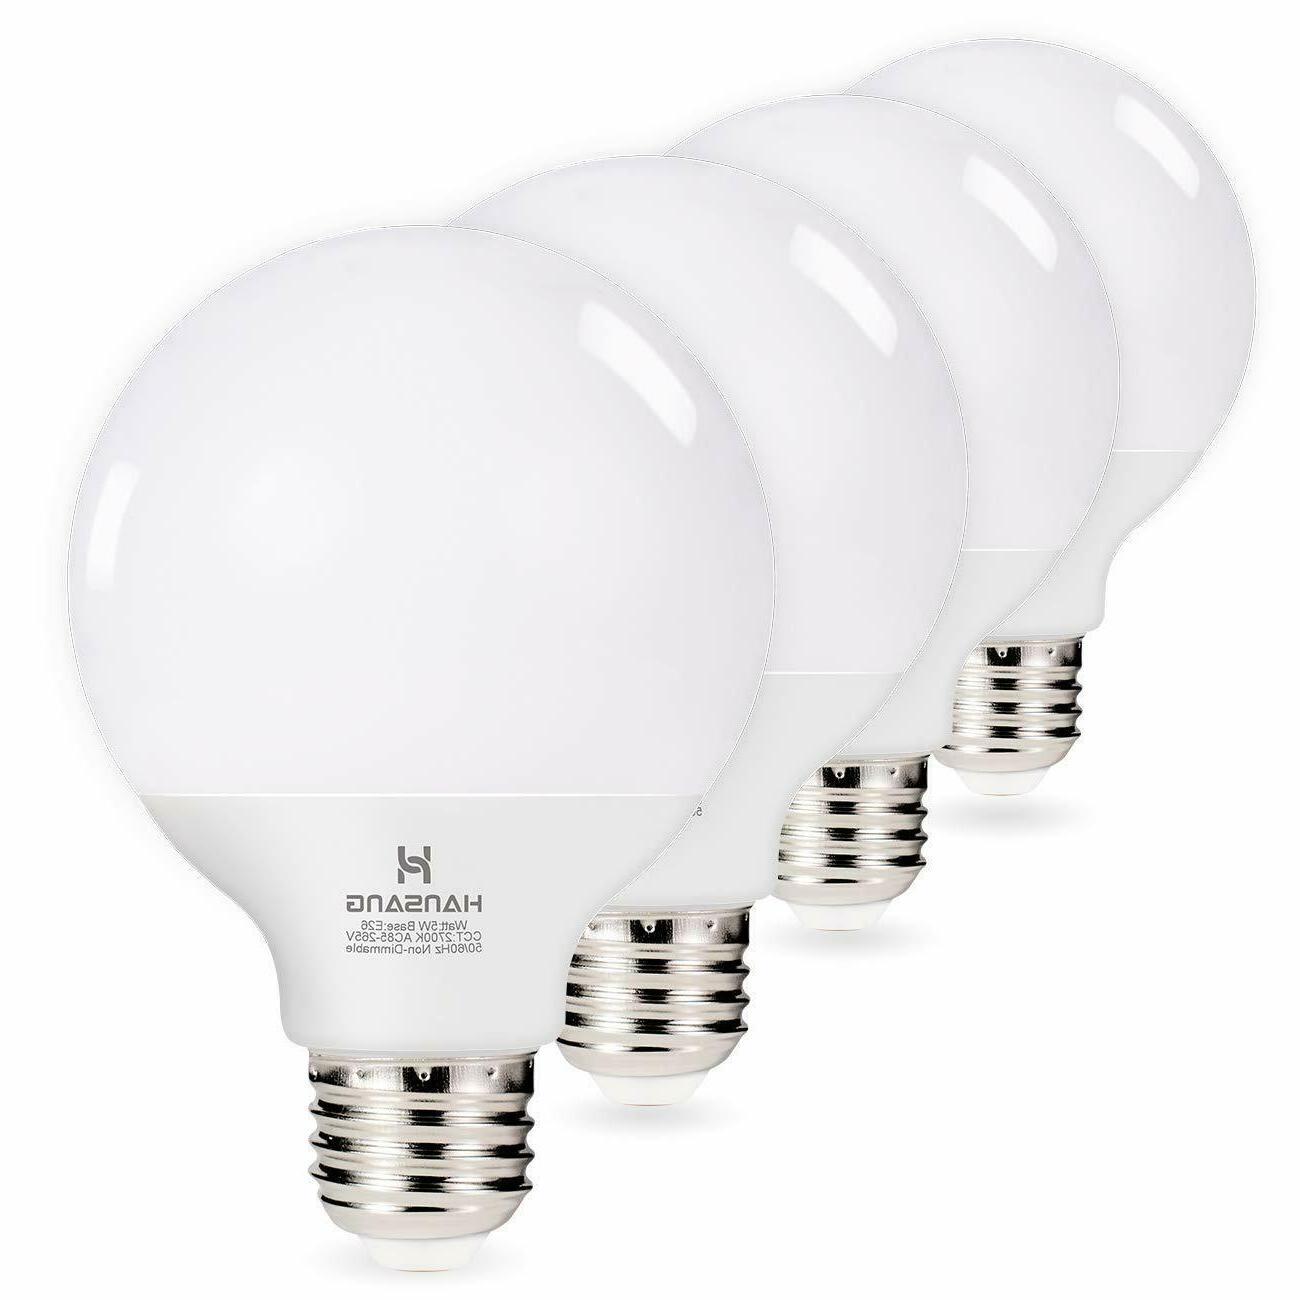 g25 led globe light bulbs 60w equivalent